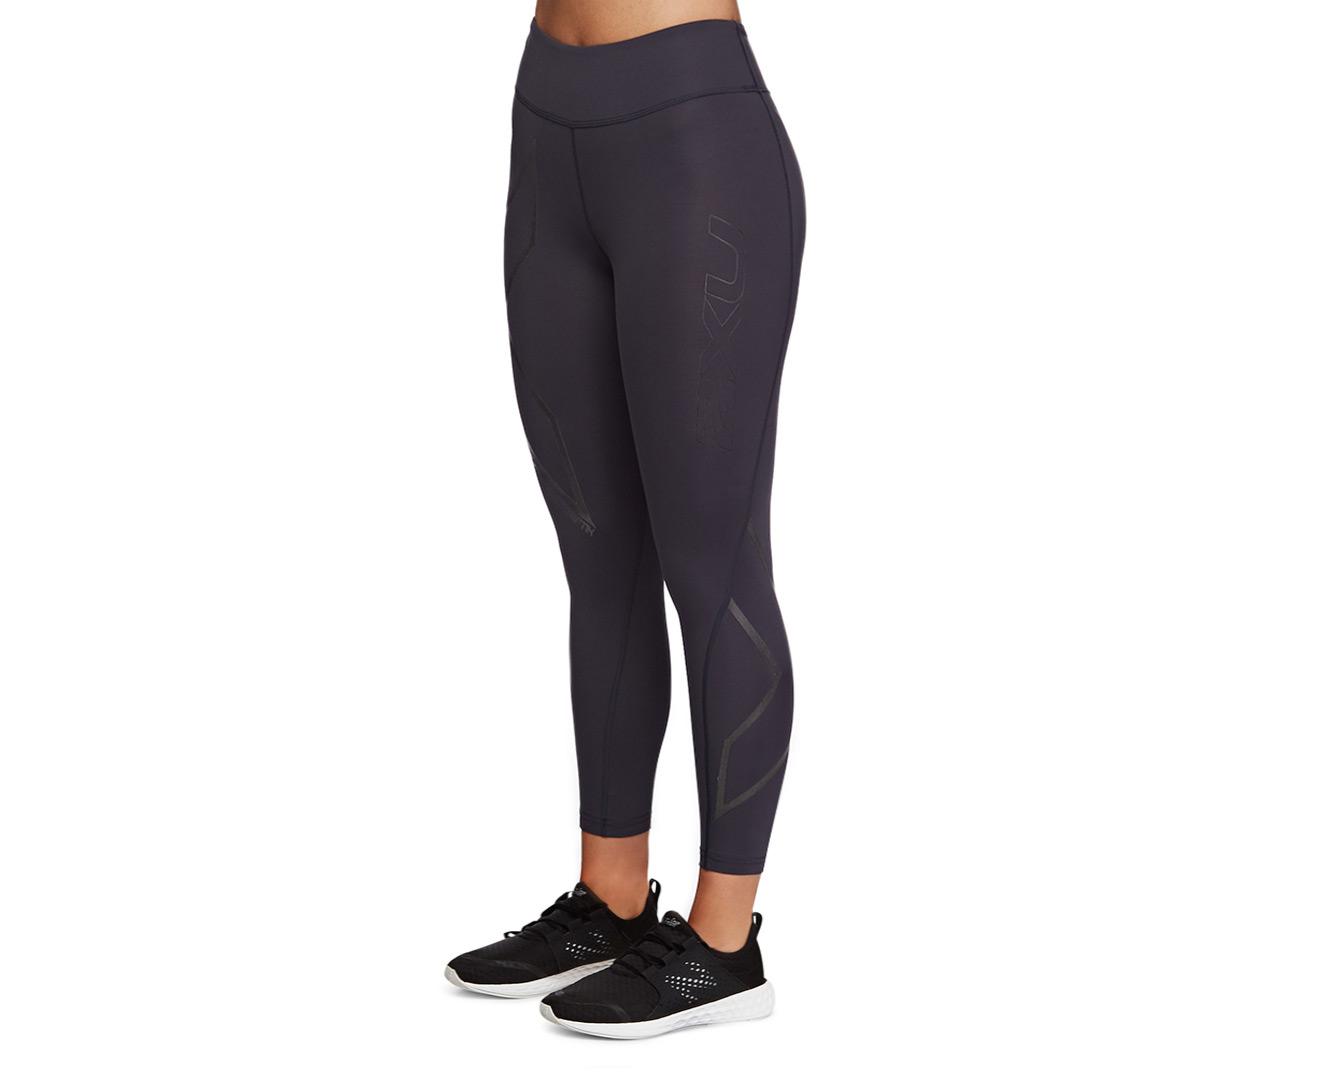 6526cce2d0 2XU Women's Hyoptik Mid-Rise Compression 7/8 Tights - Steel/Black  Reflective | Catch.com.au